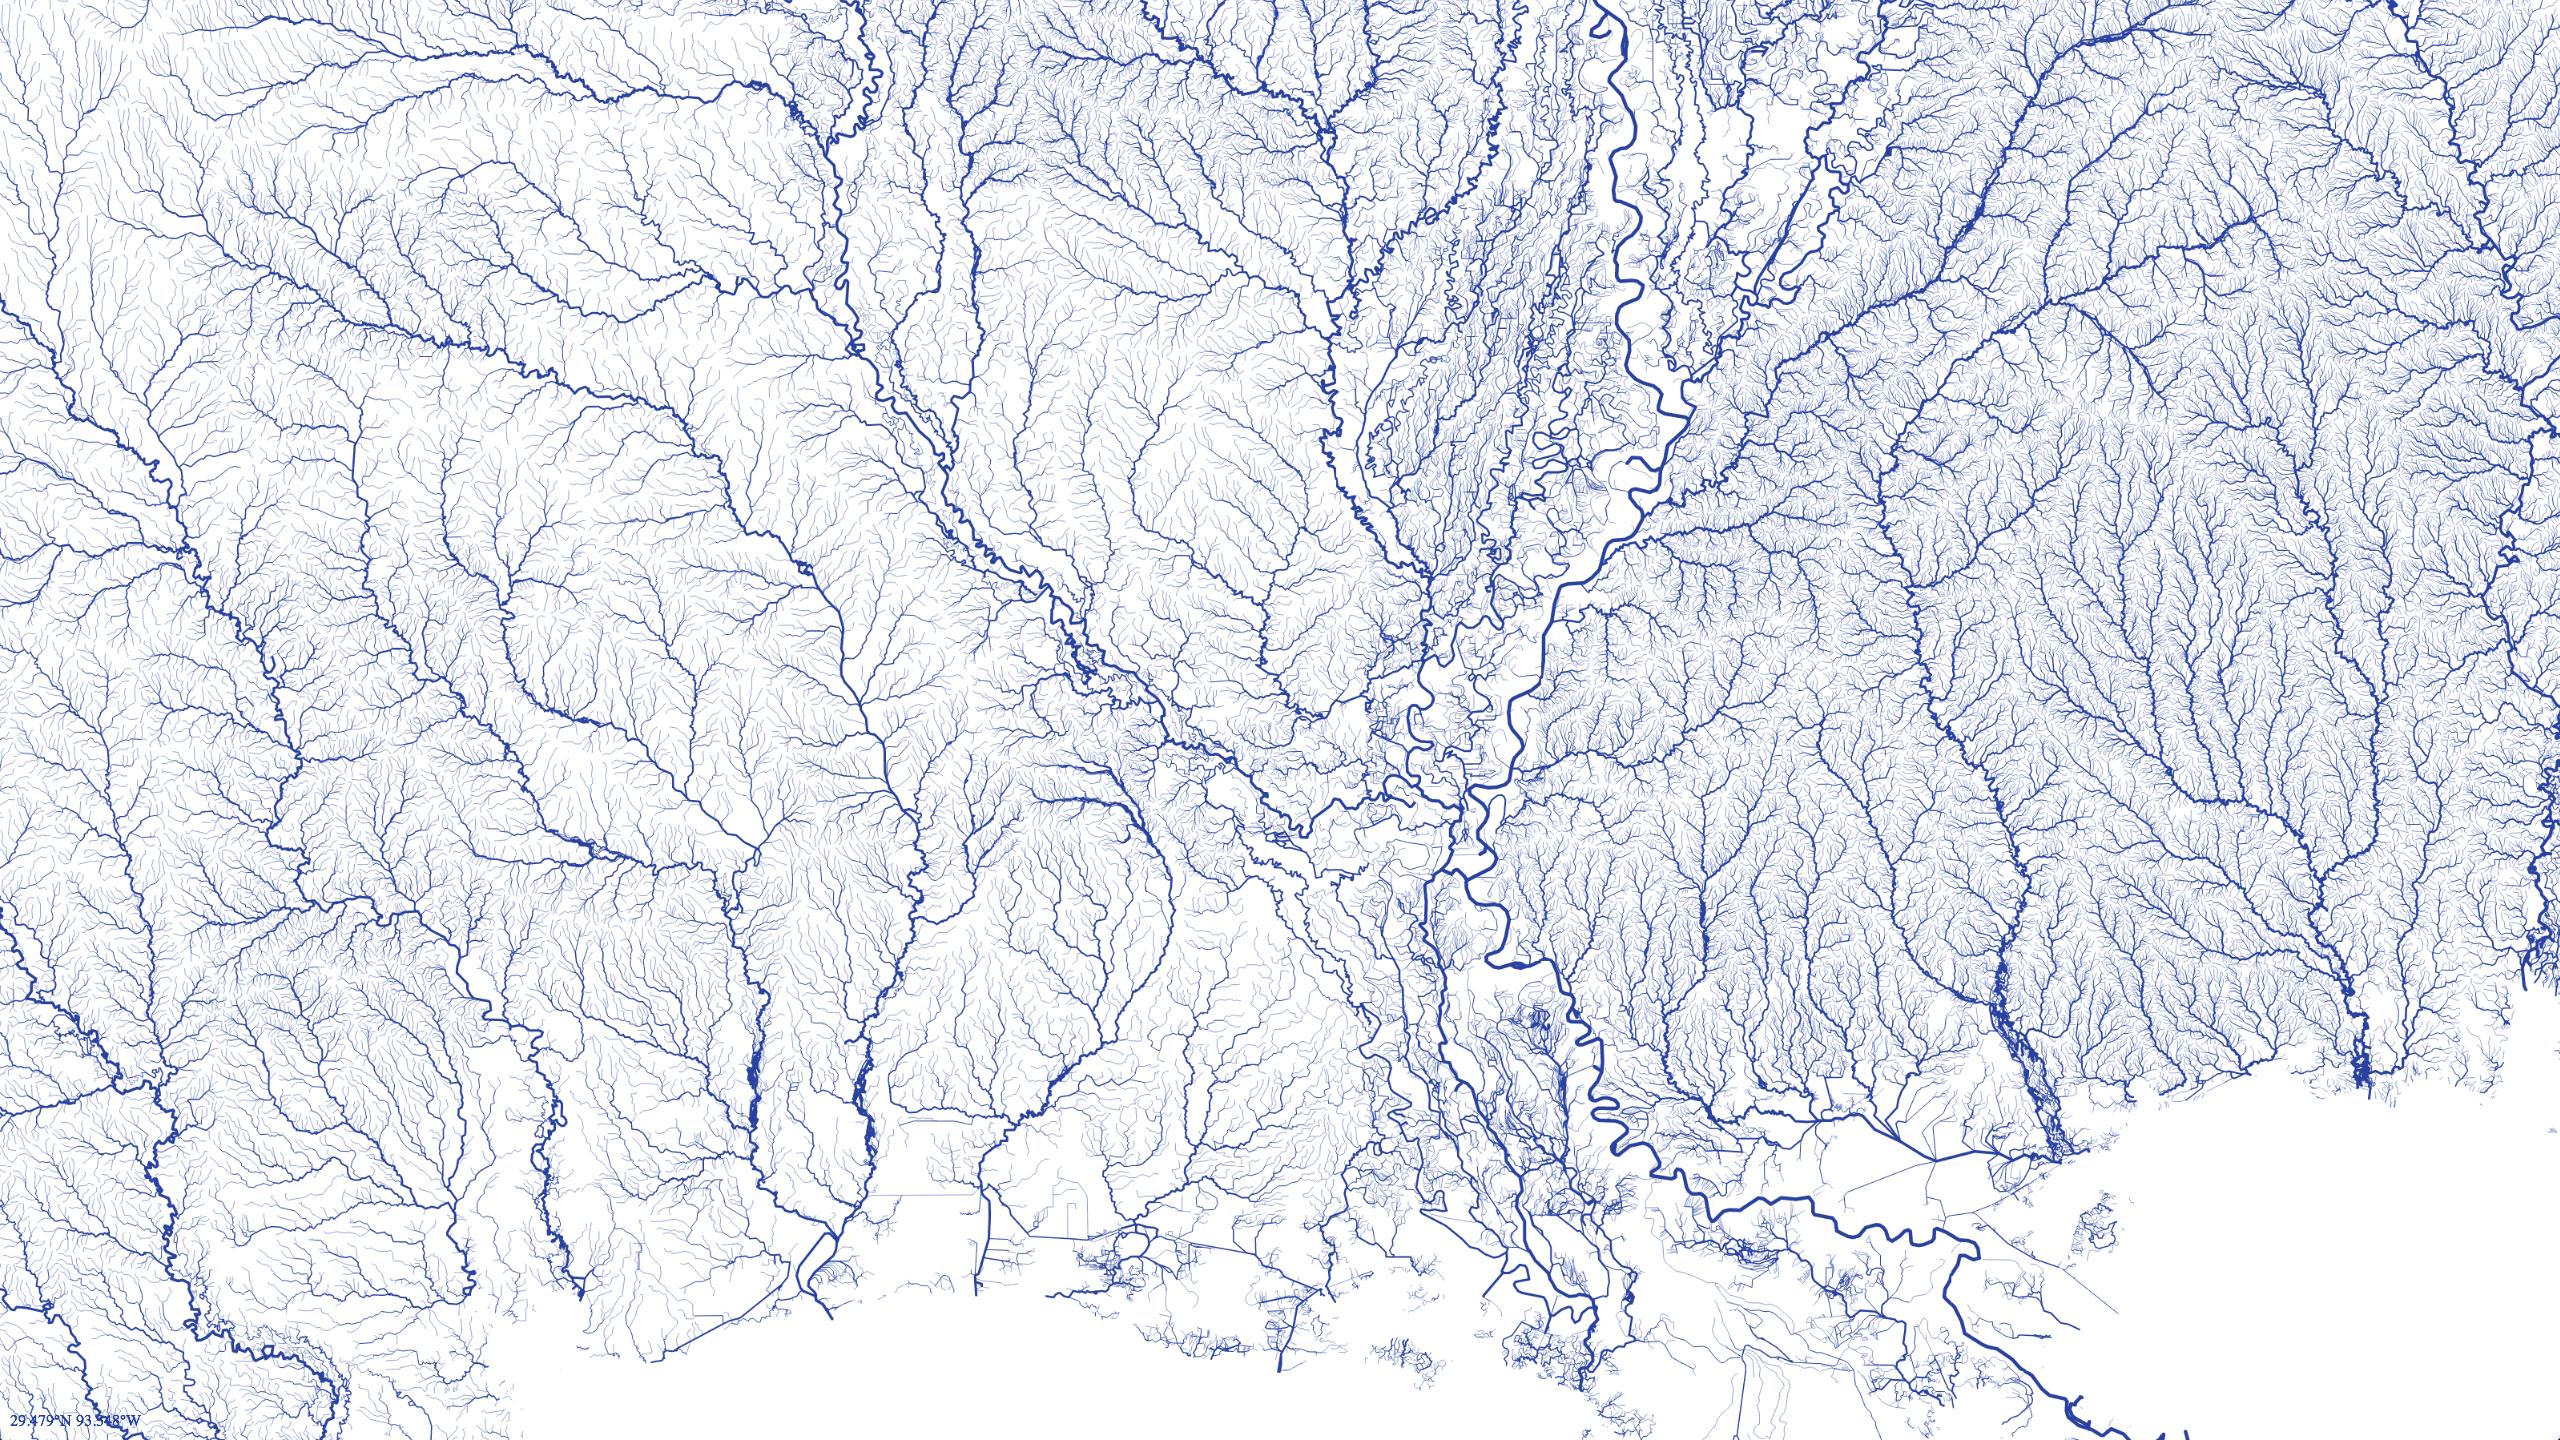 Rivers in Louisiana and the Gulf coast